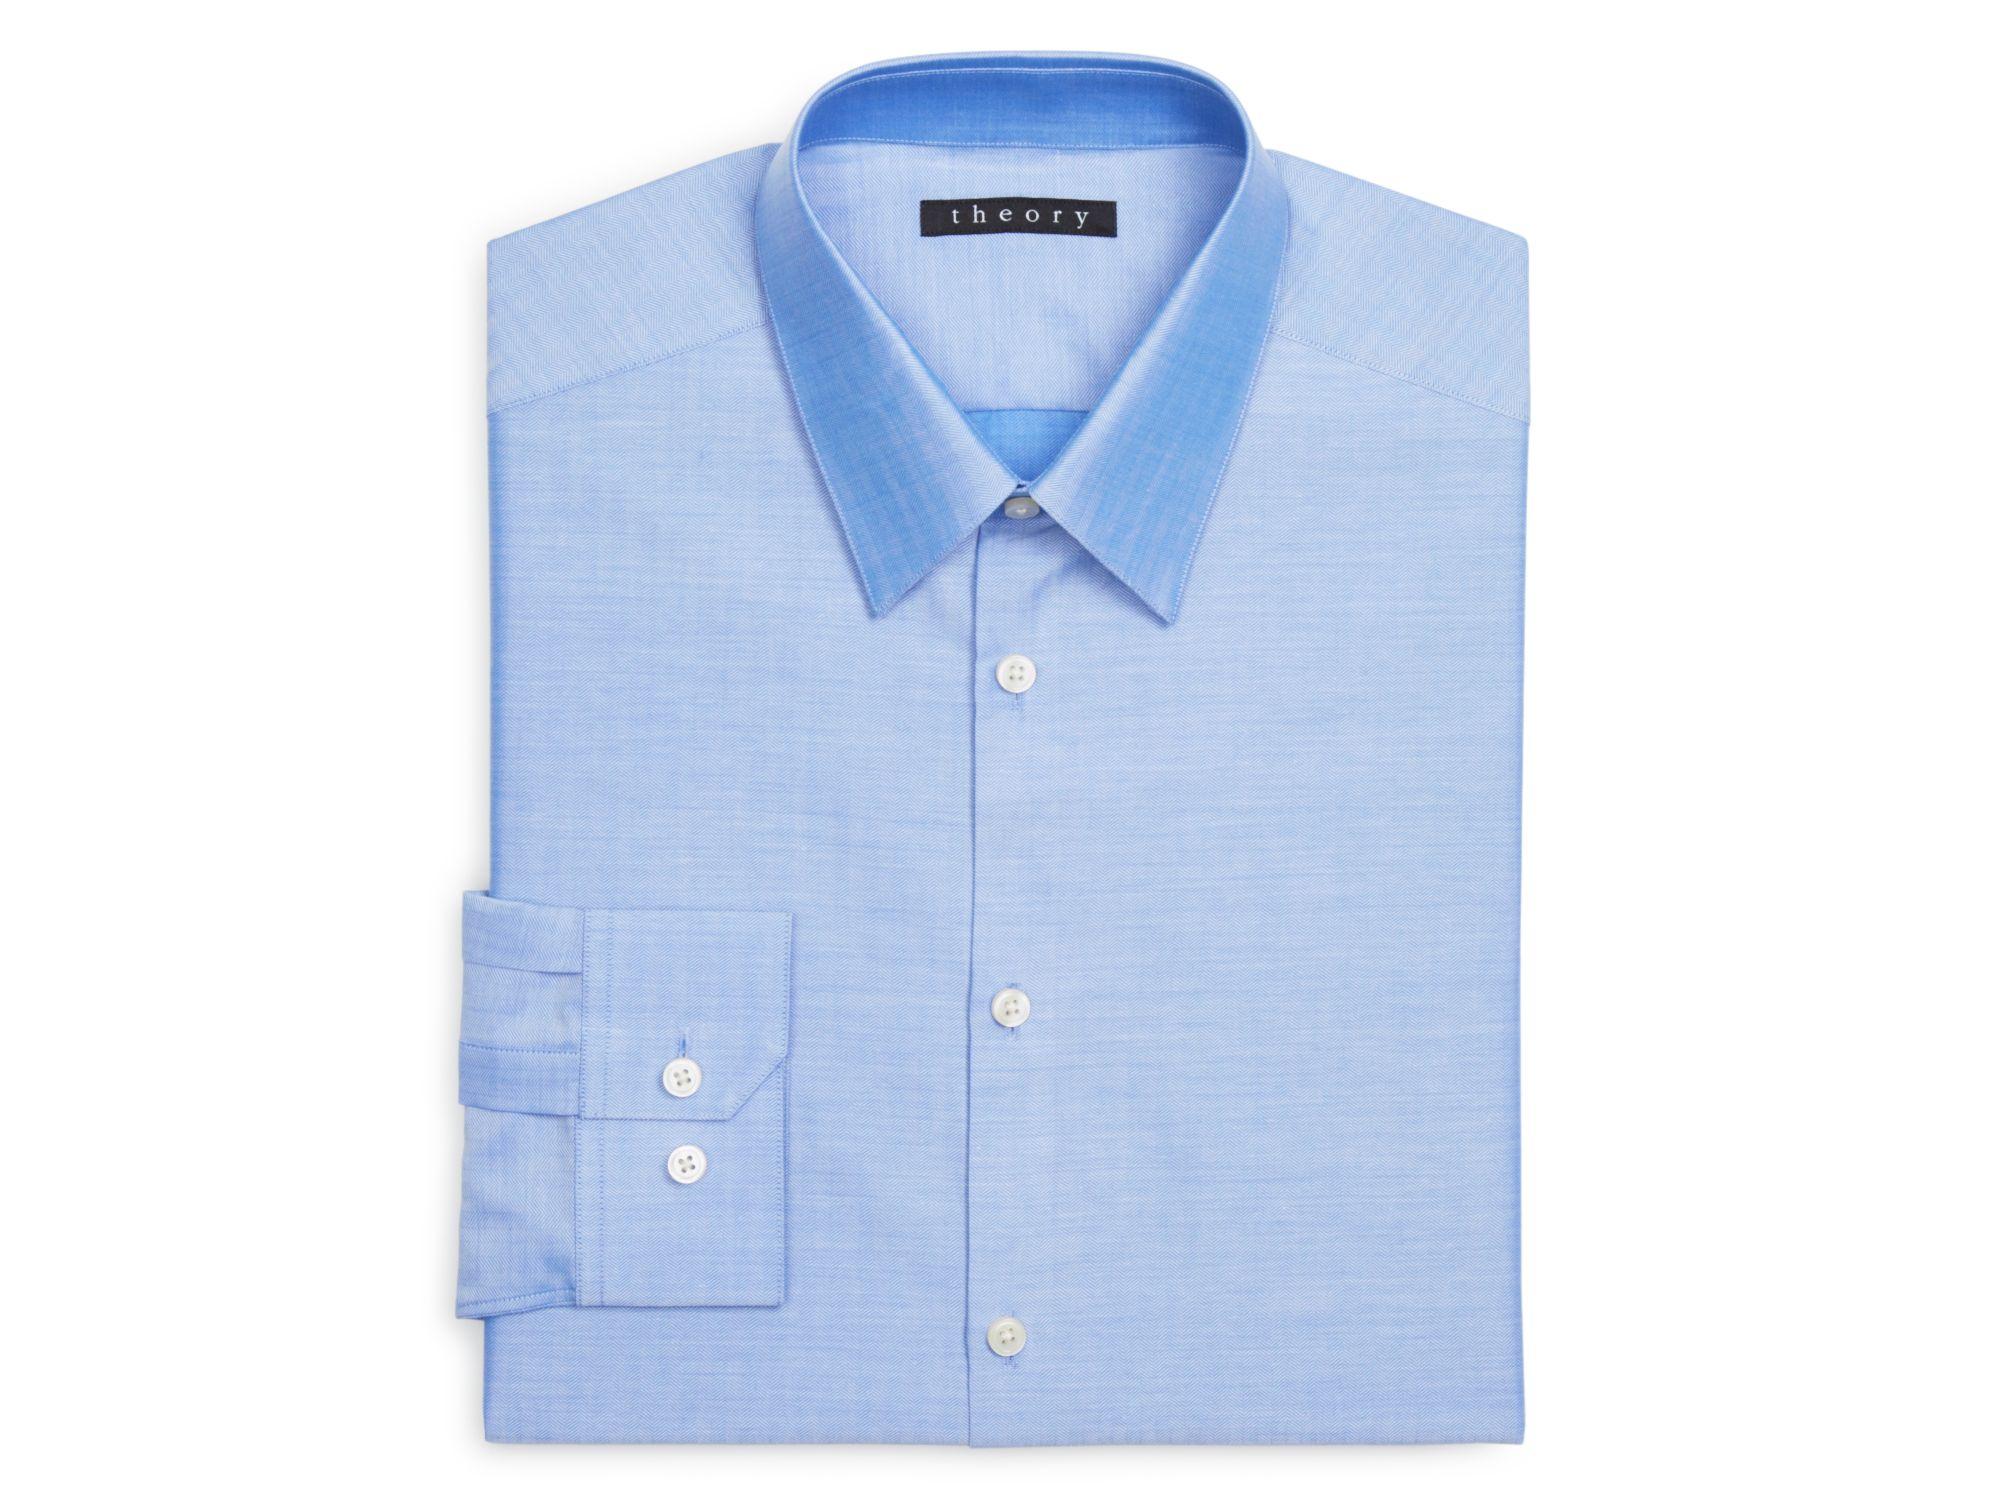 Theory sparlan regular fit dress shirt in blue for men lyst for Regular fit dress shirt